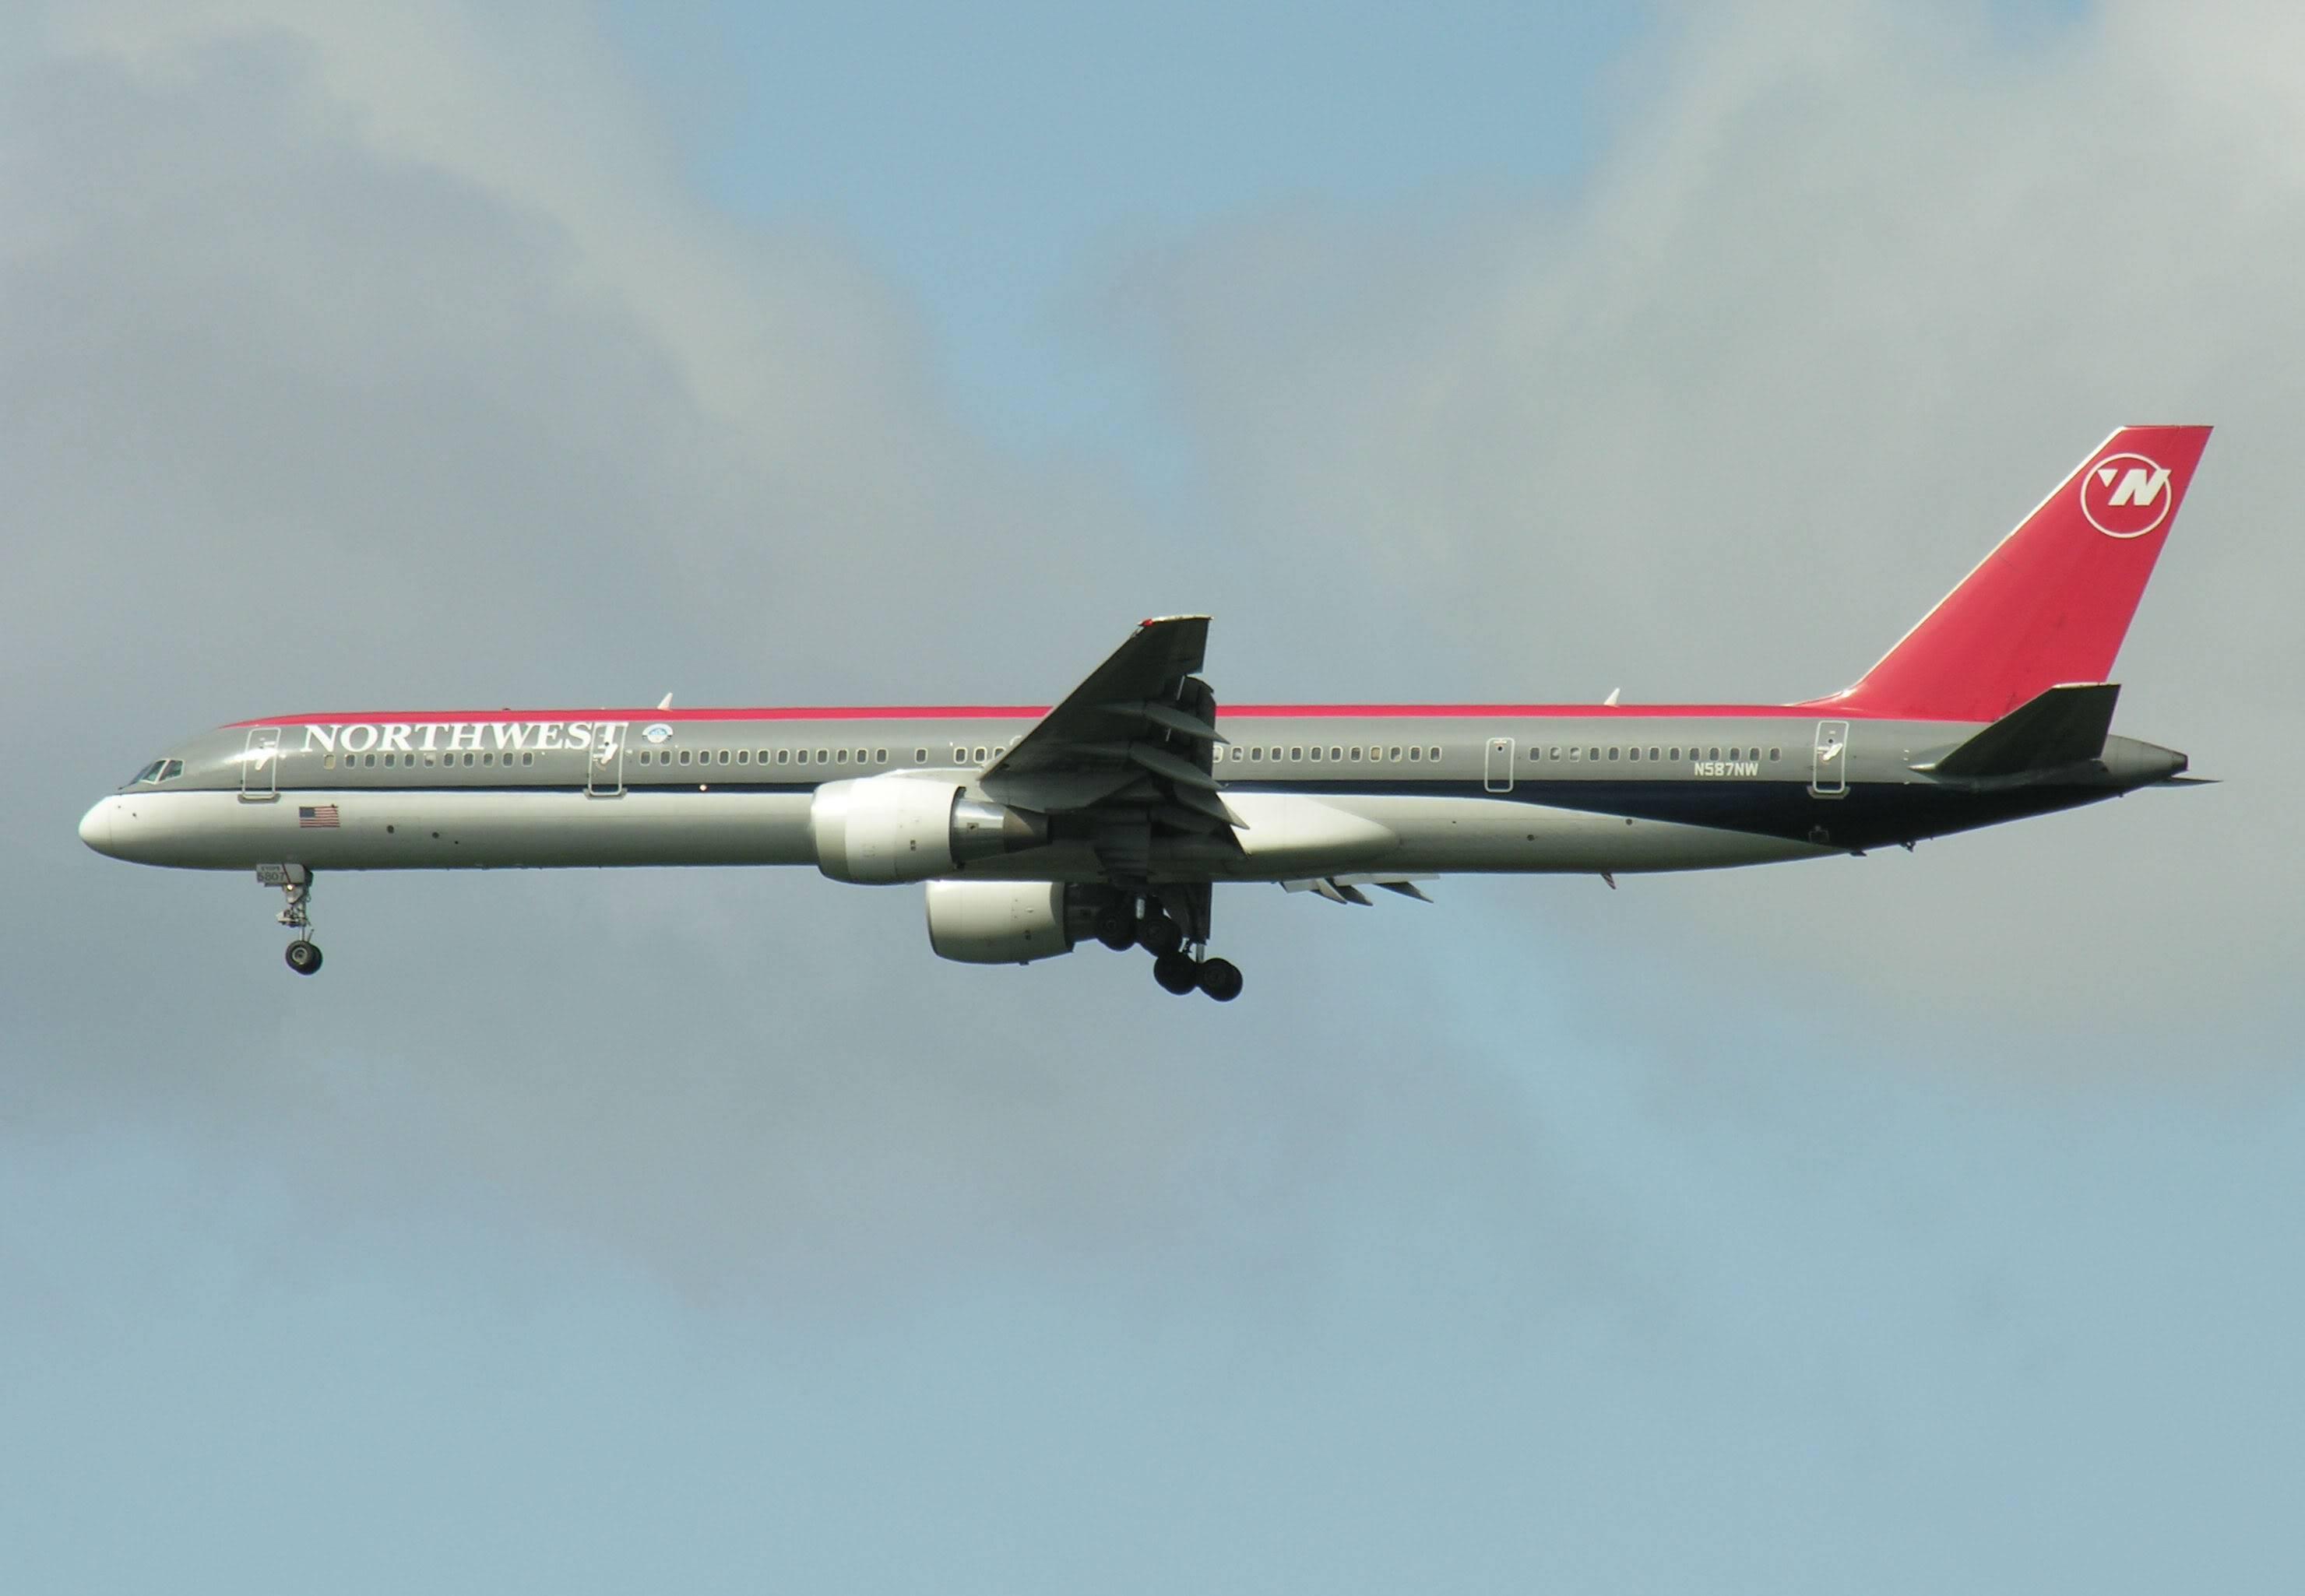 Airplane | 飛行機 | Máy bay Airplane20Preparing20to20Land